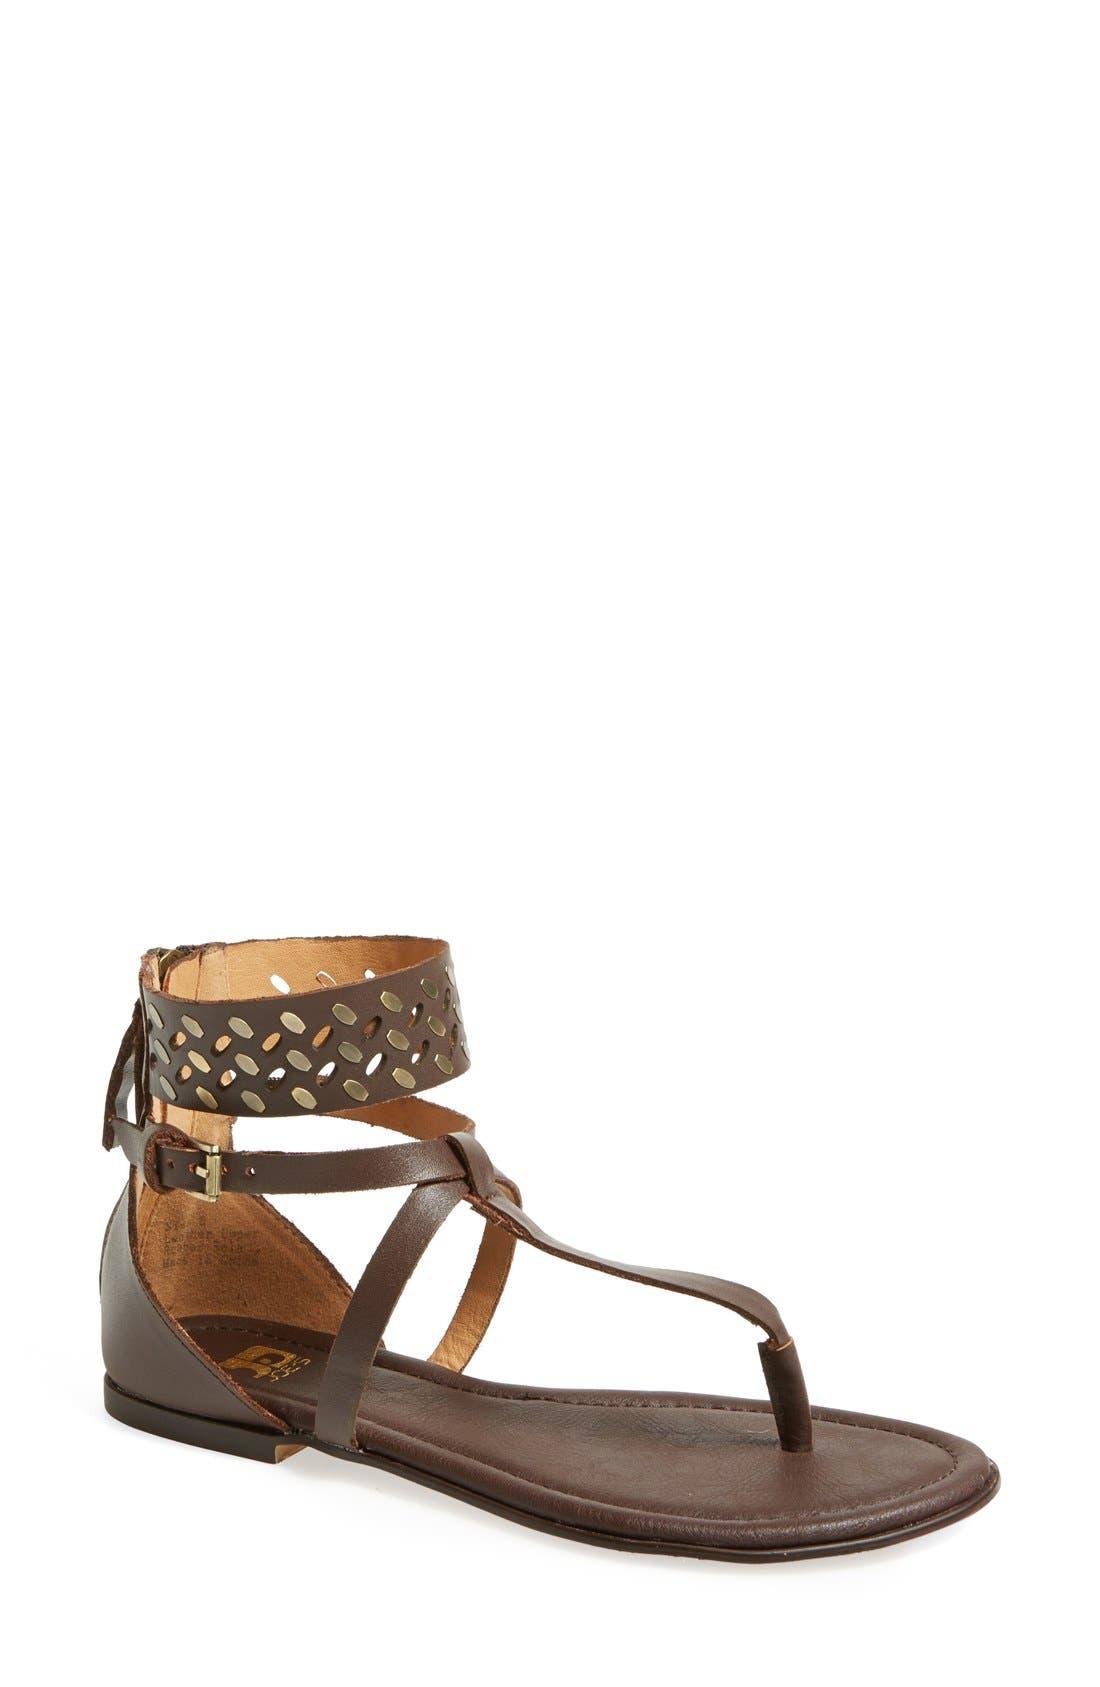 Main Image - Joe's 'Effie' Embellished Leather Sandal